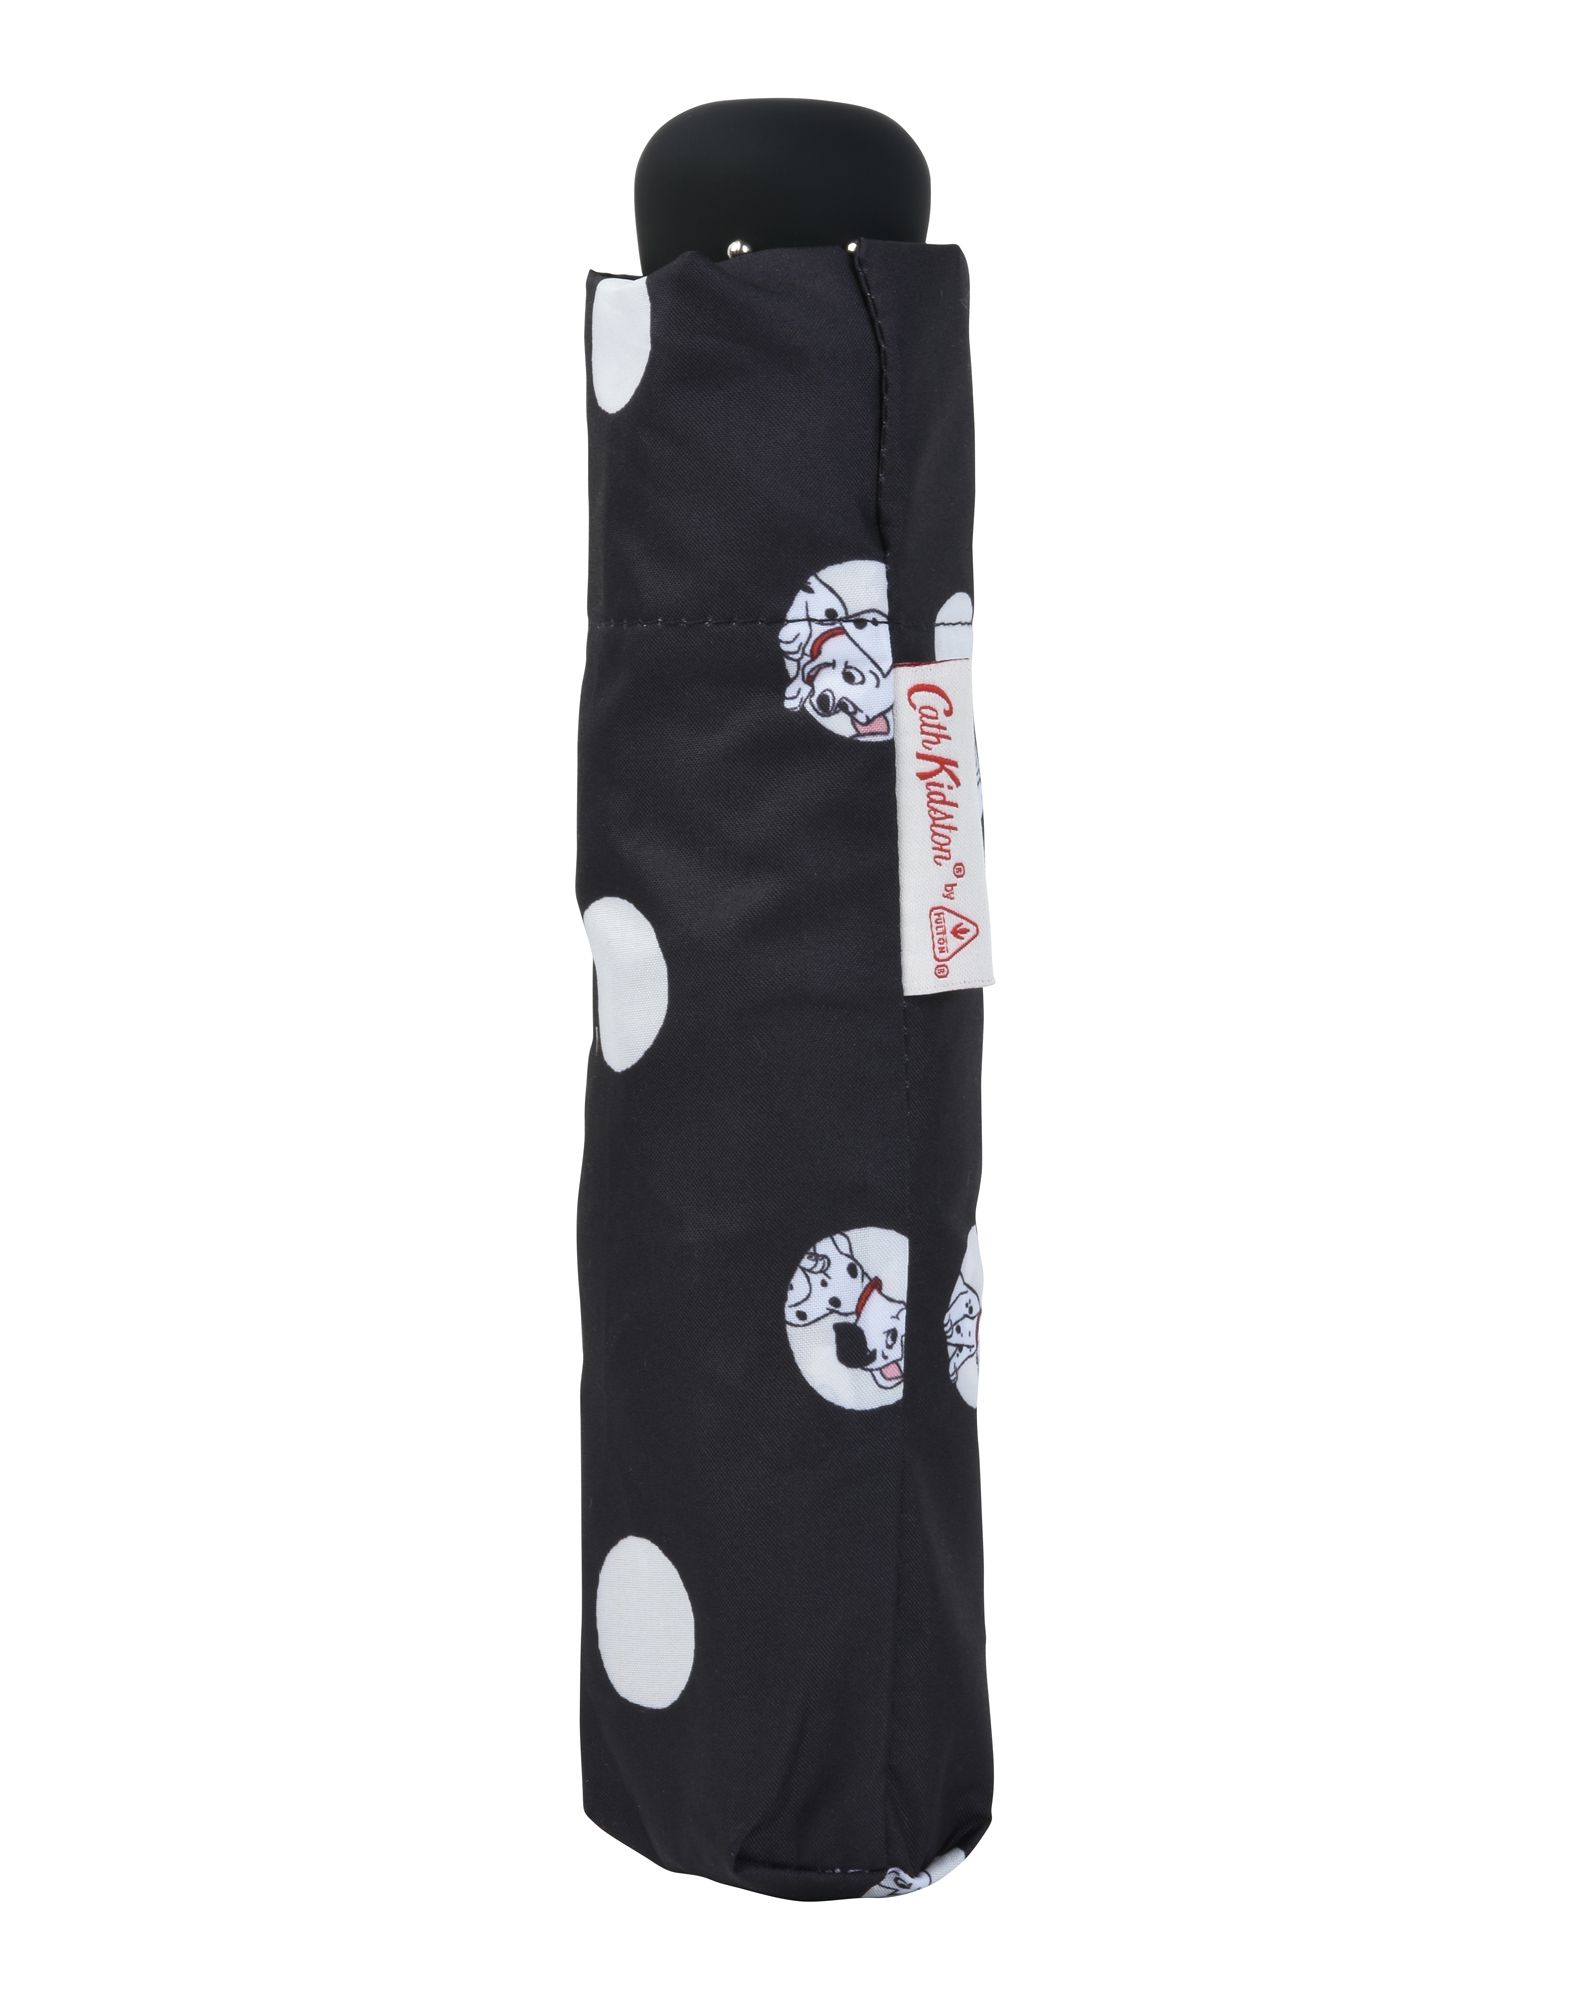 цены на CATH KIDSTON x DISNEY Зонт в интернет-магазинах